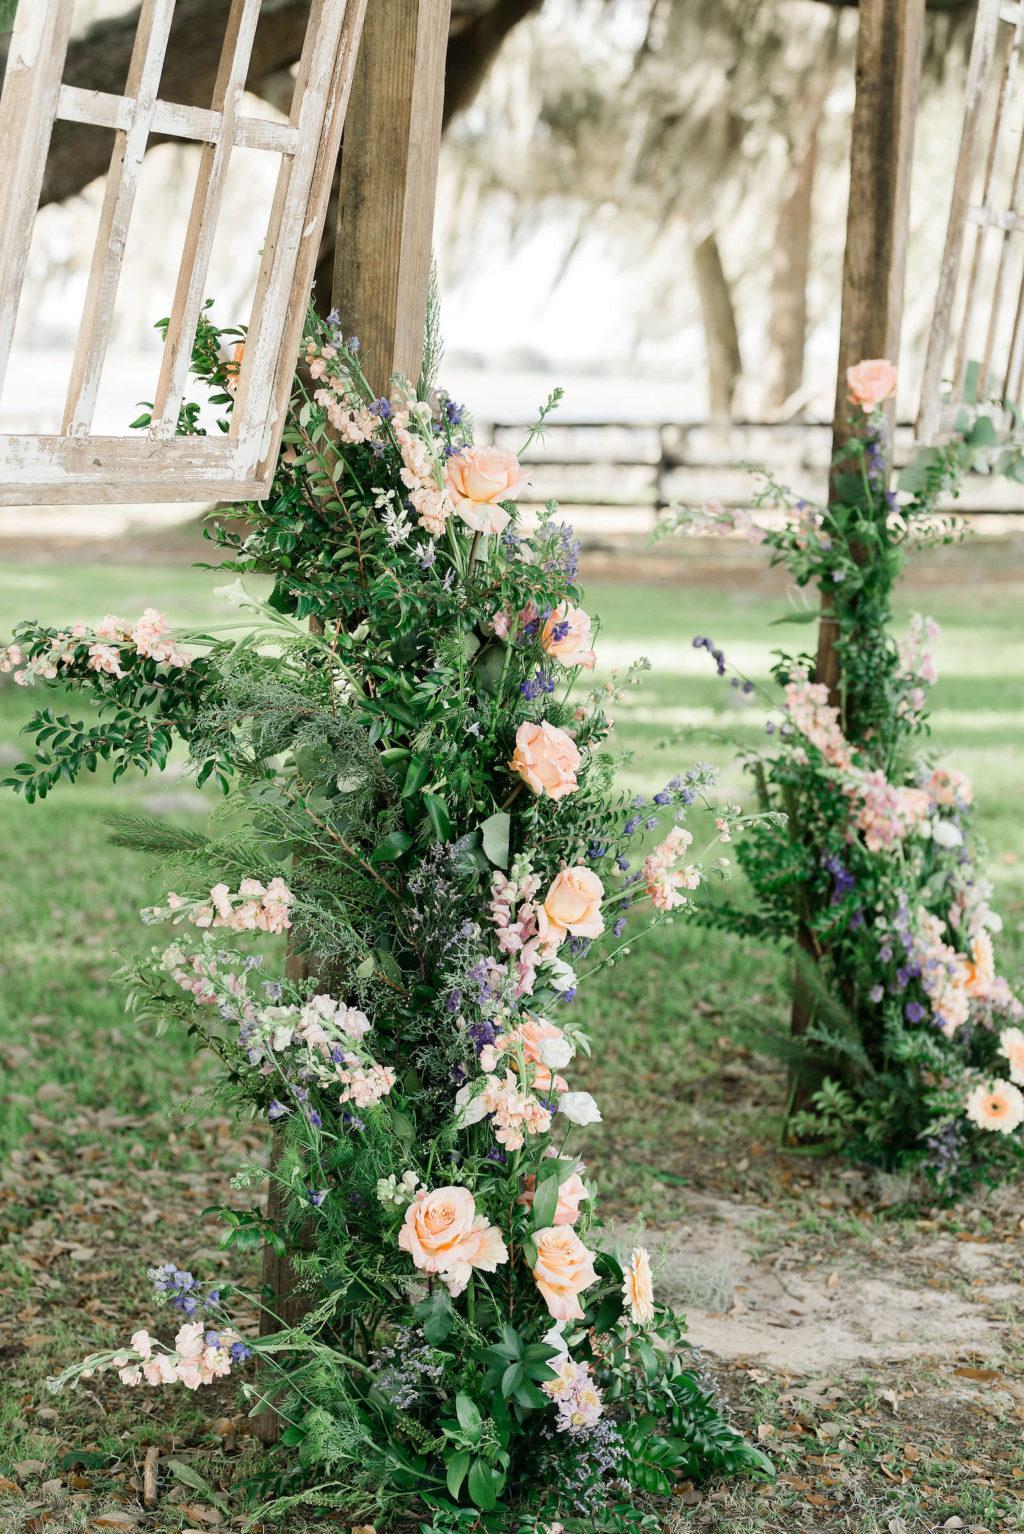 Tampa Farm Wedding Venue   Floral Décor Details with Greenery   Covington Farm